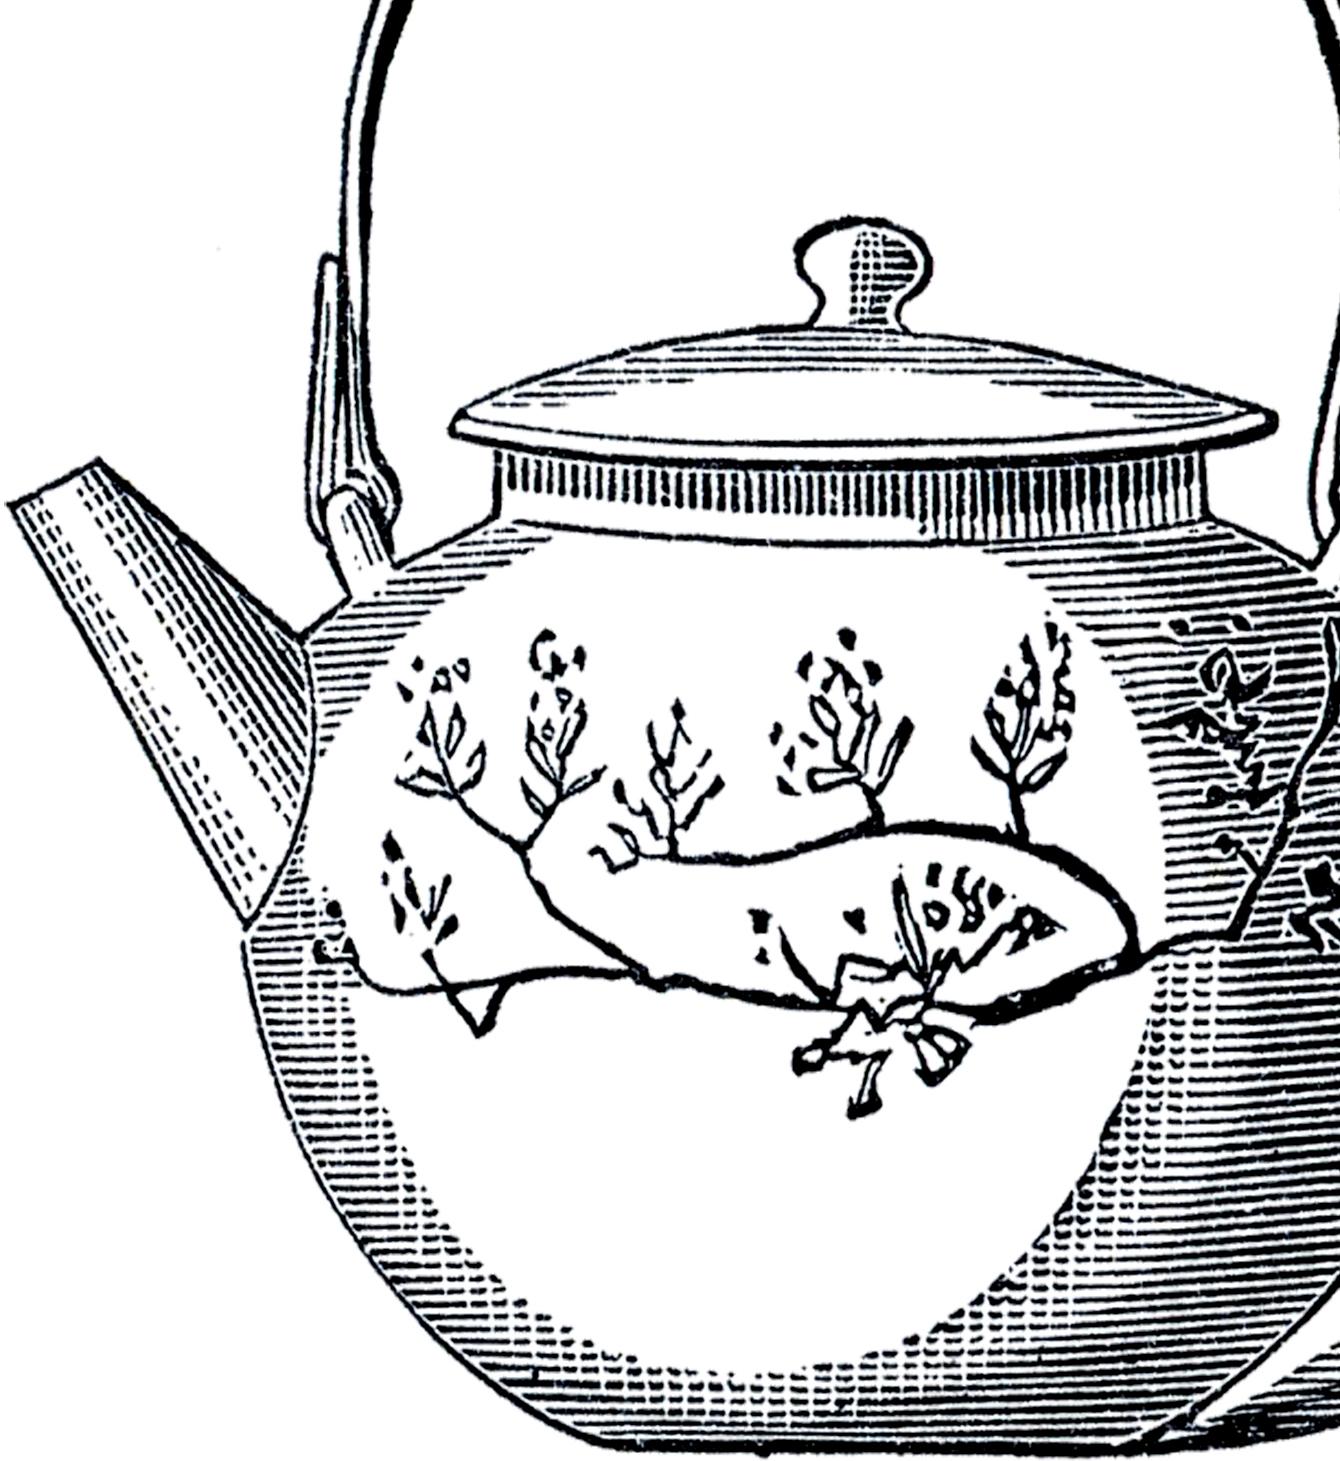 Vintage Asian Teapot Image The Graphics Fairy